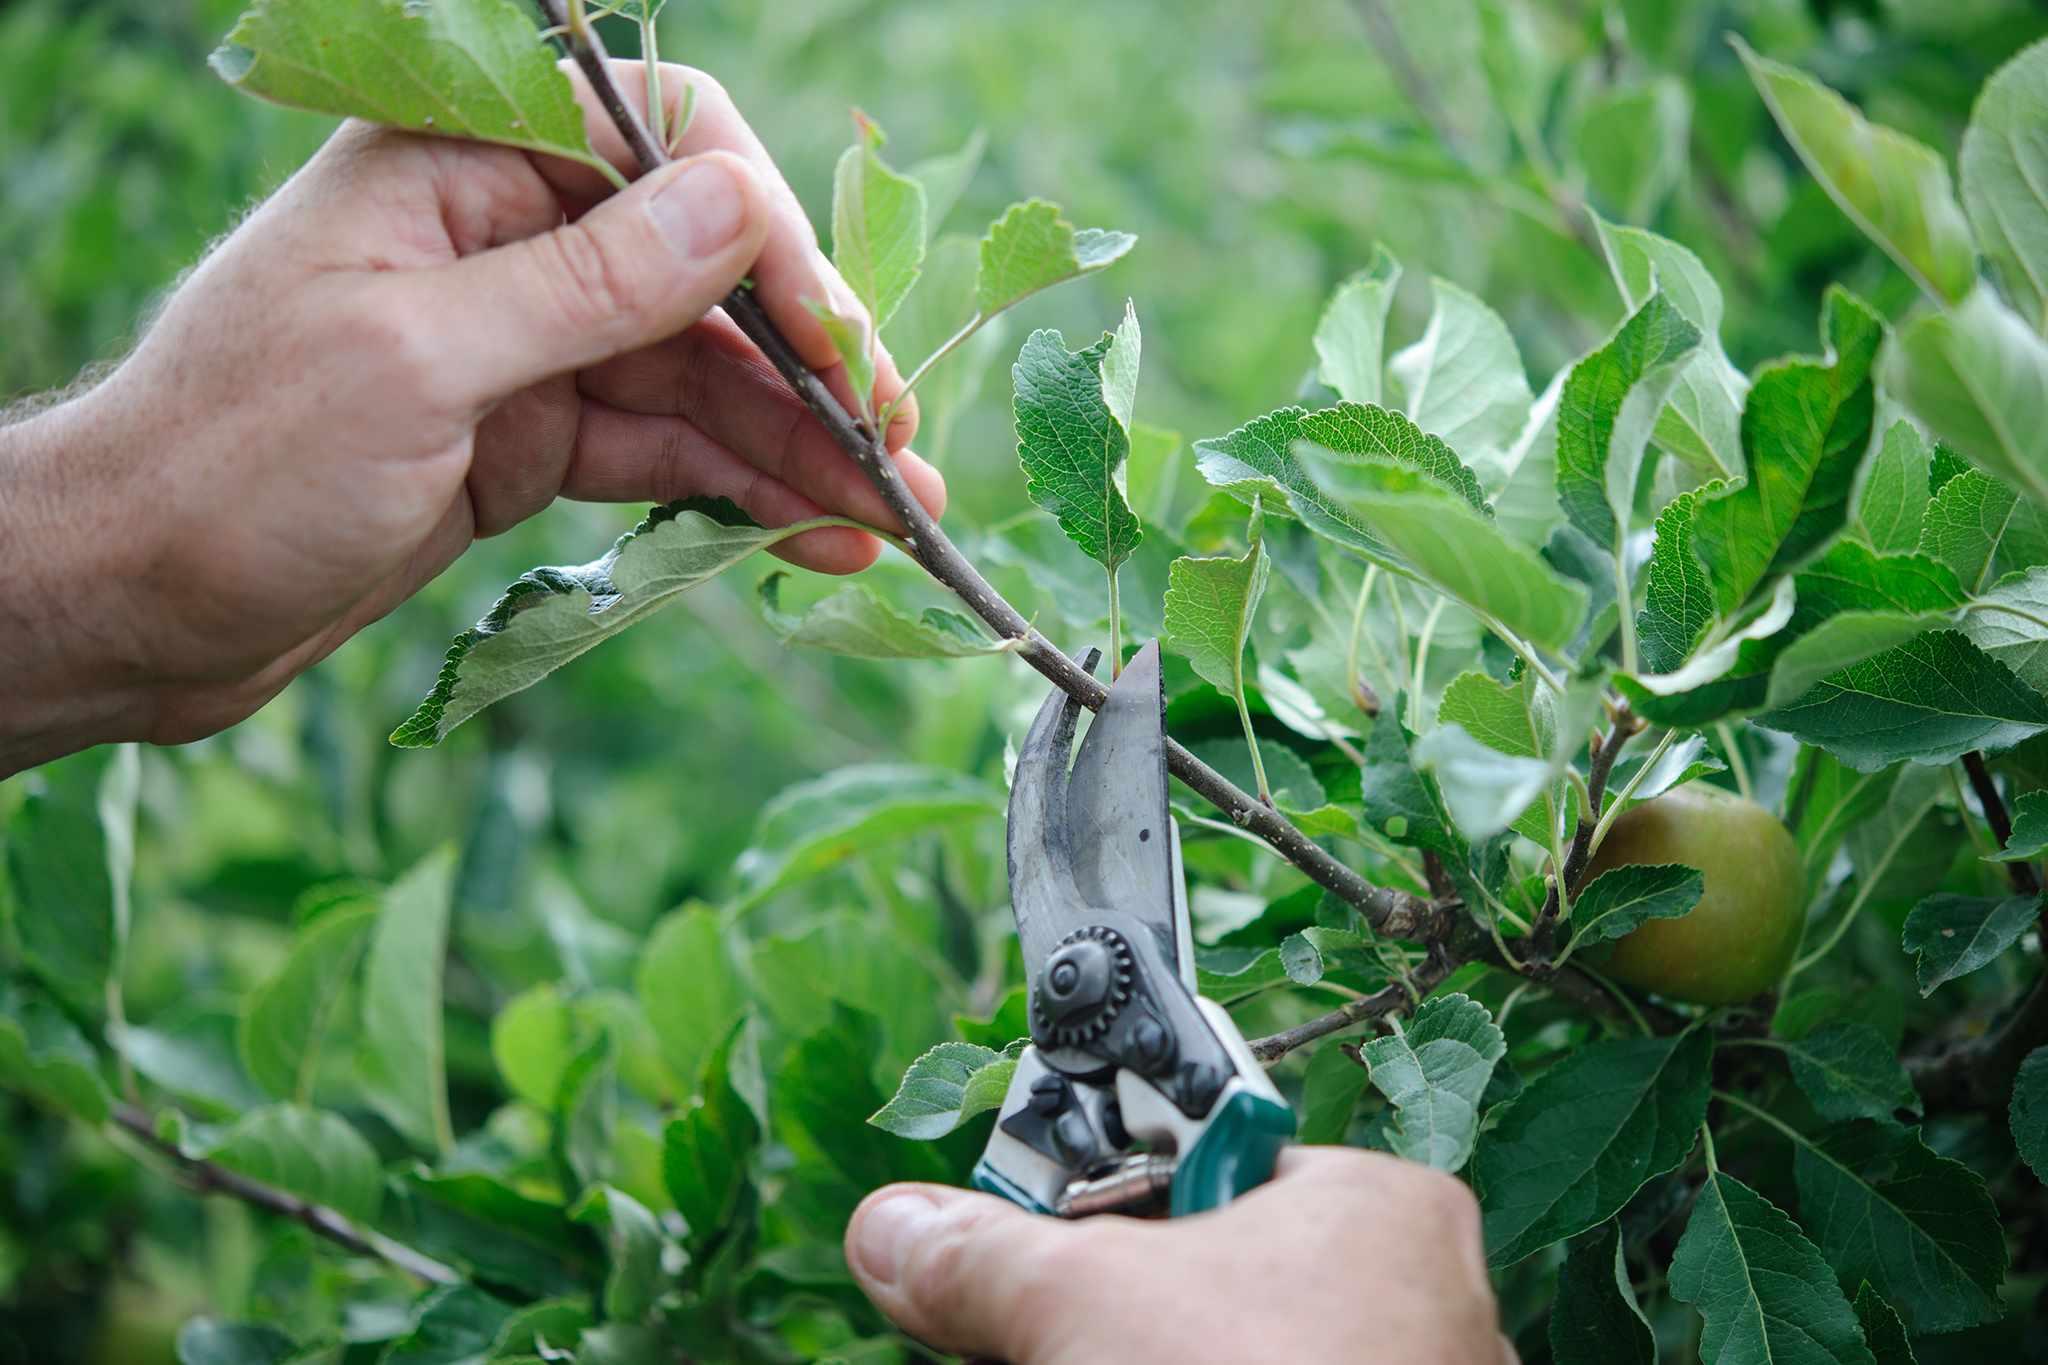 Pruning fruit trees in summer